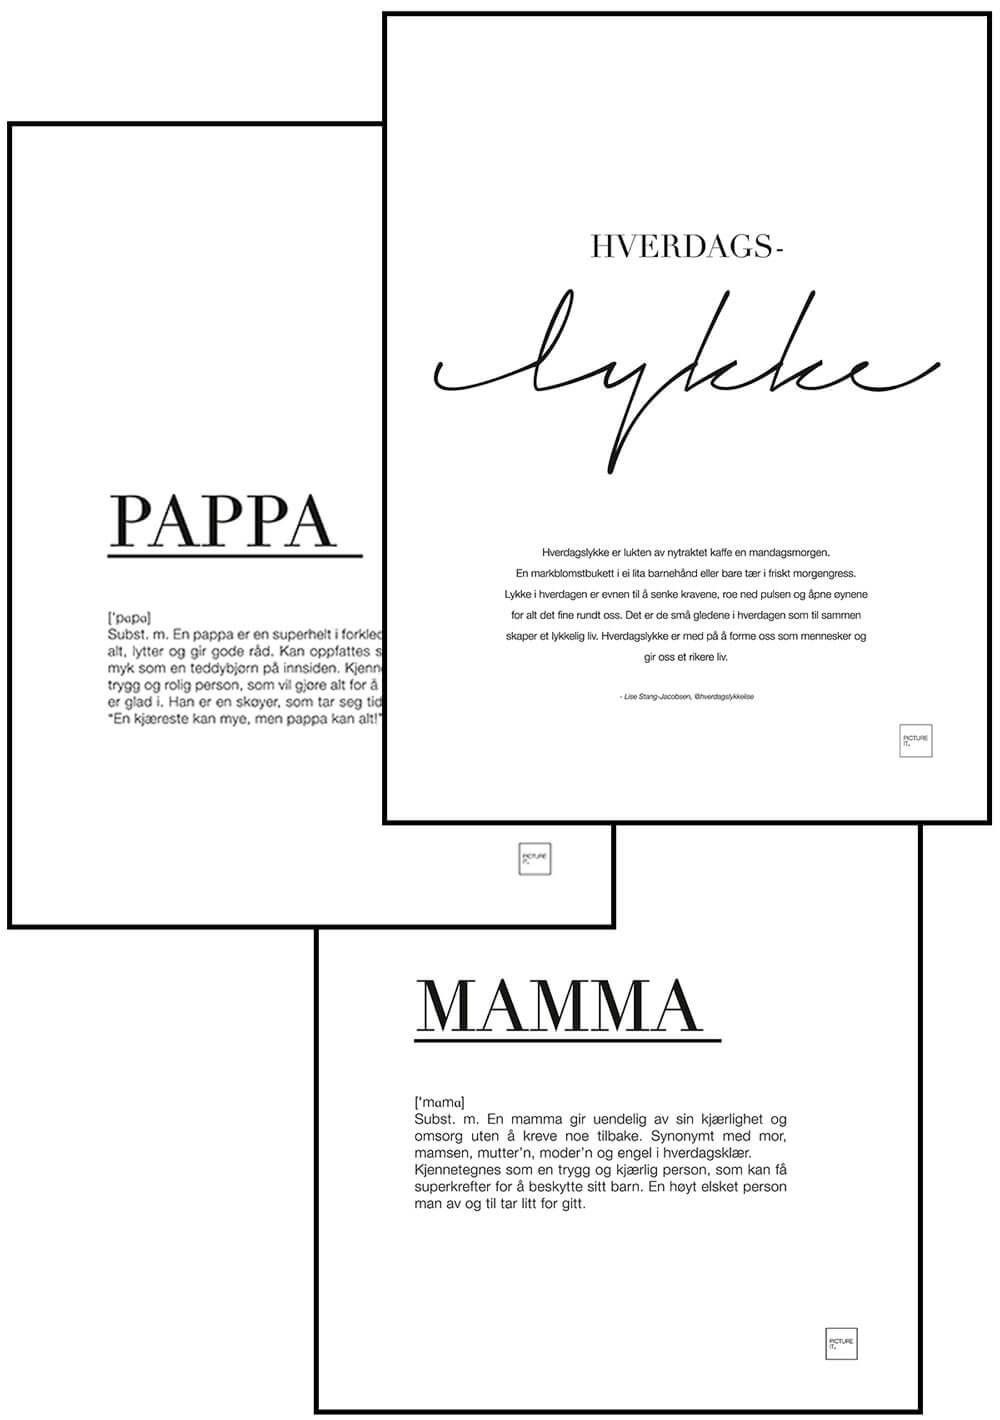 MAMMA + PAPPA + HVERDAGSLYKKE posters